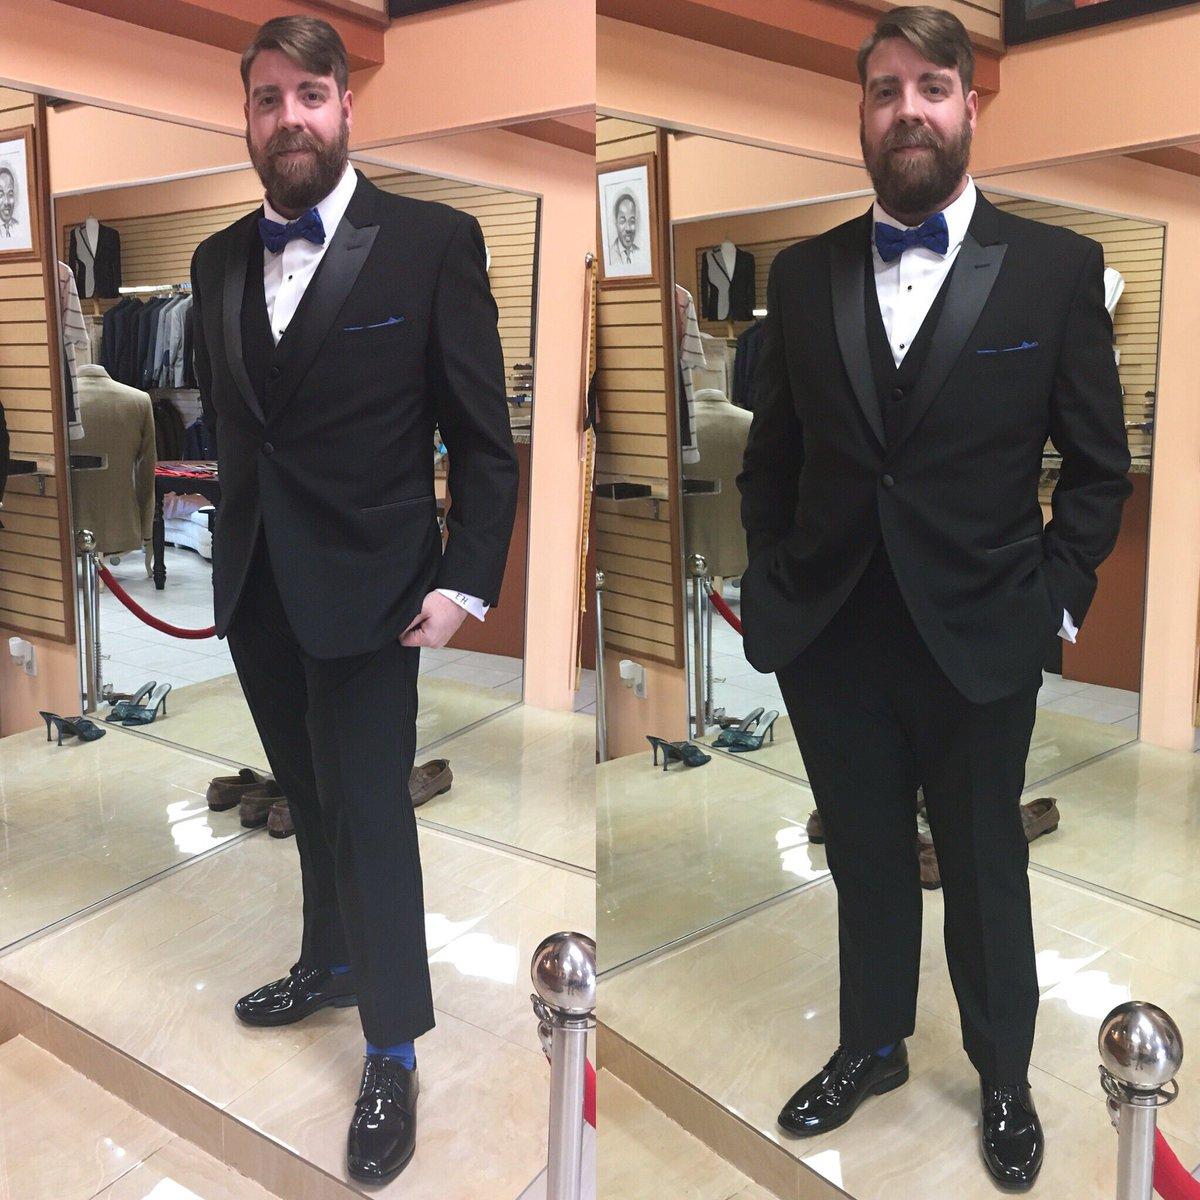 Suitsupply tuxedo rental